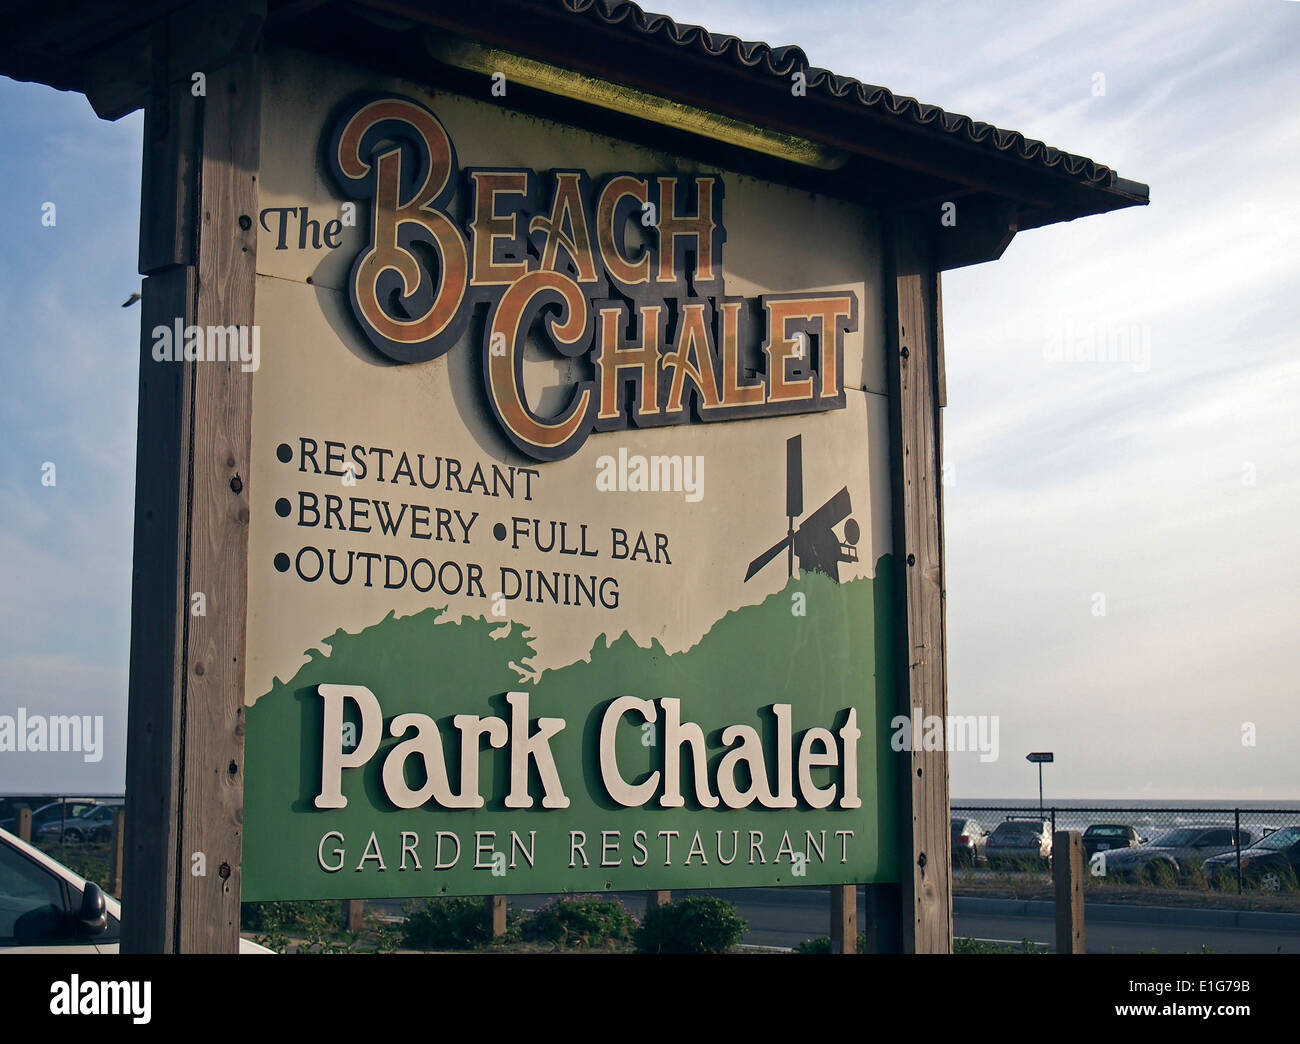 The Beach Chalet restaurant sign, San Francisco - Stock Image